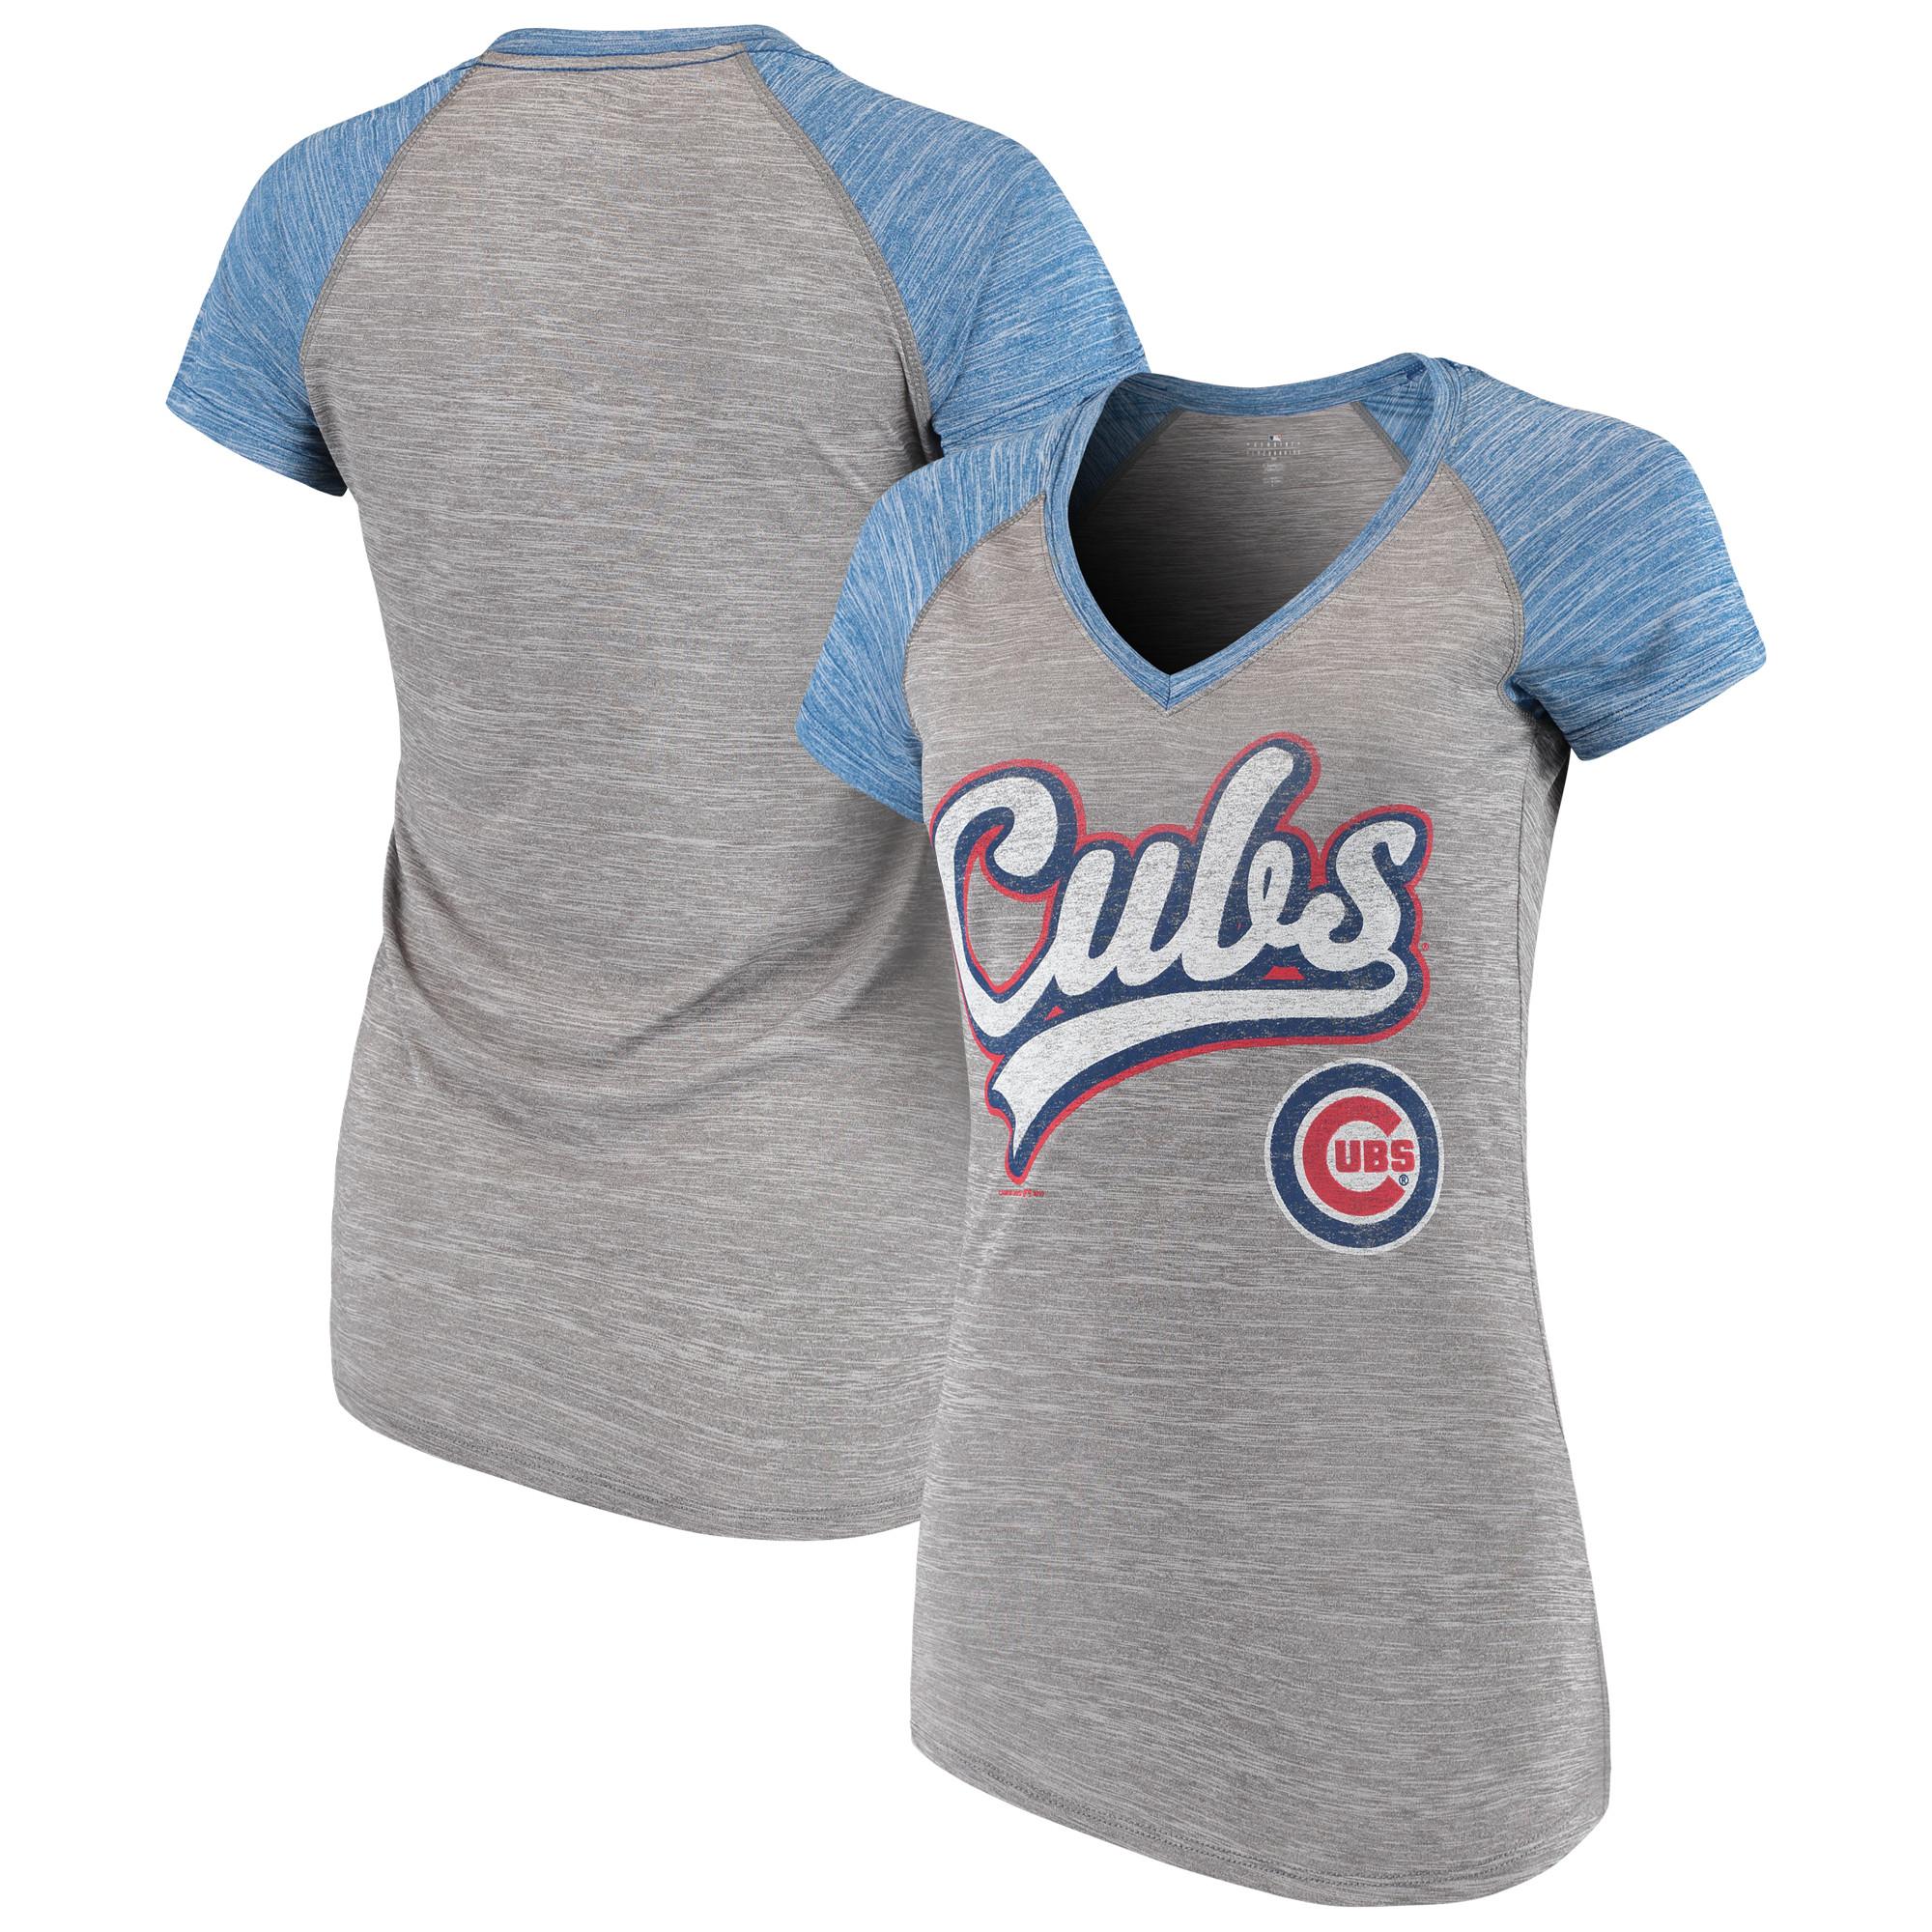 Women's New Era Gray Chicago Cubs Space Dye V-Neck T-Shirt